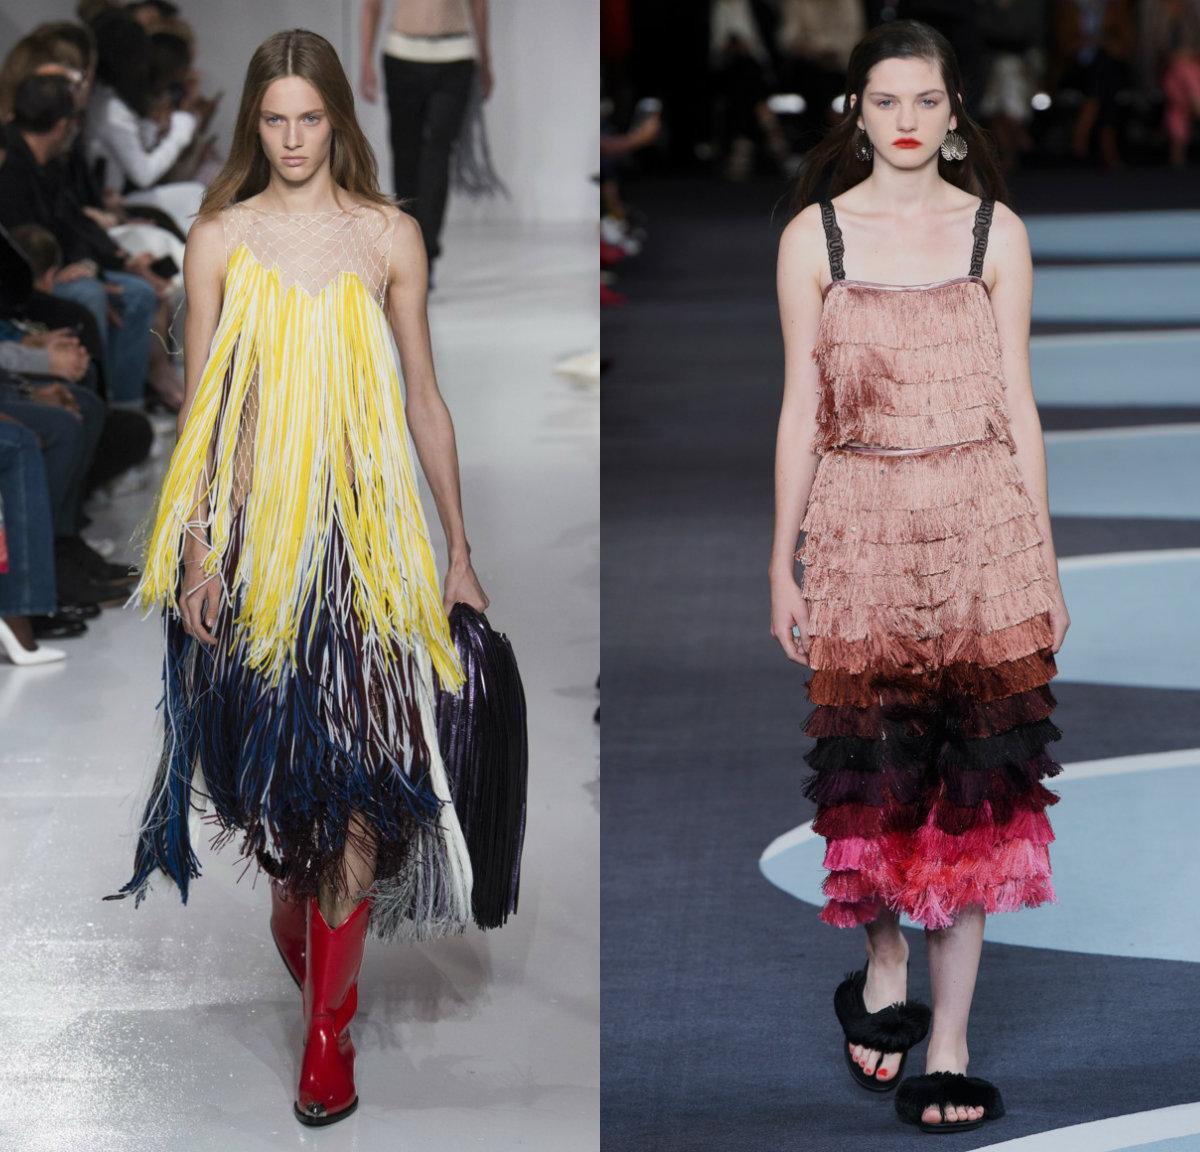 женская мода 2019: авангардные модели